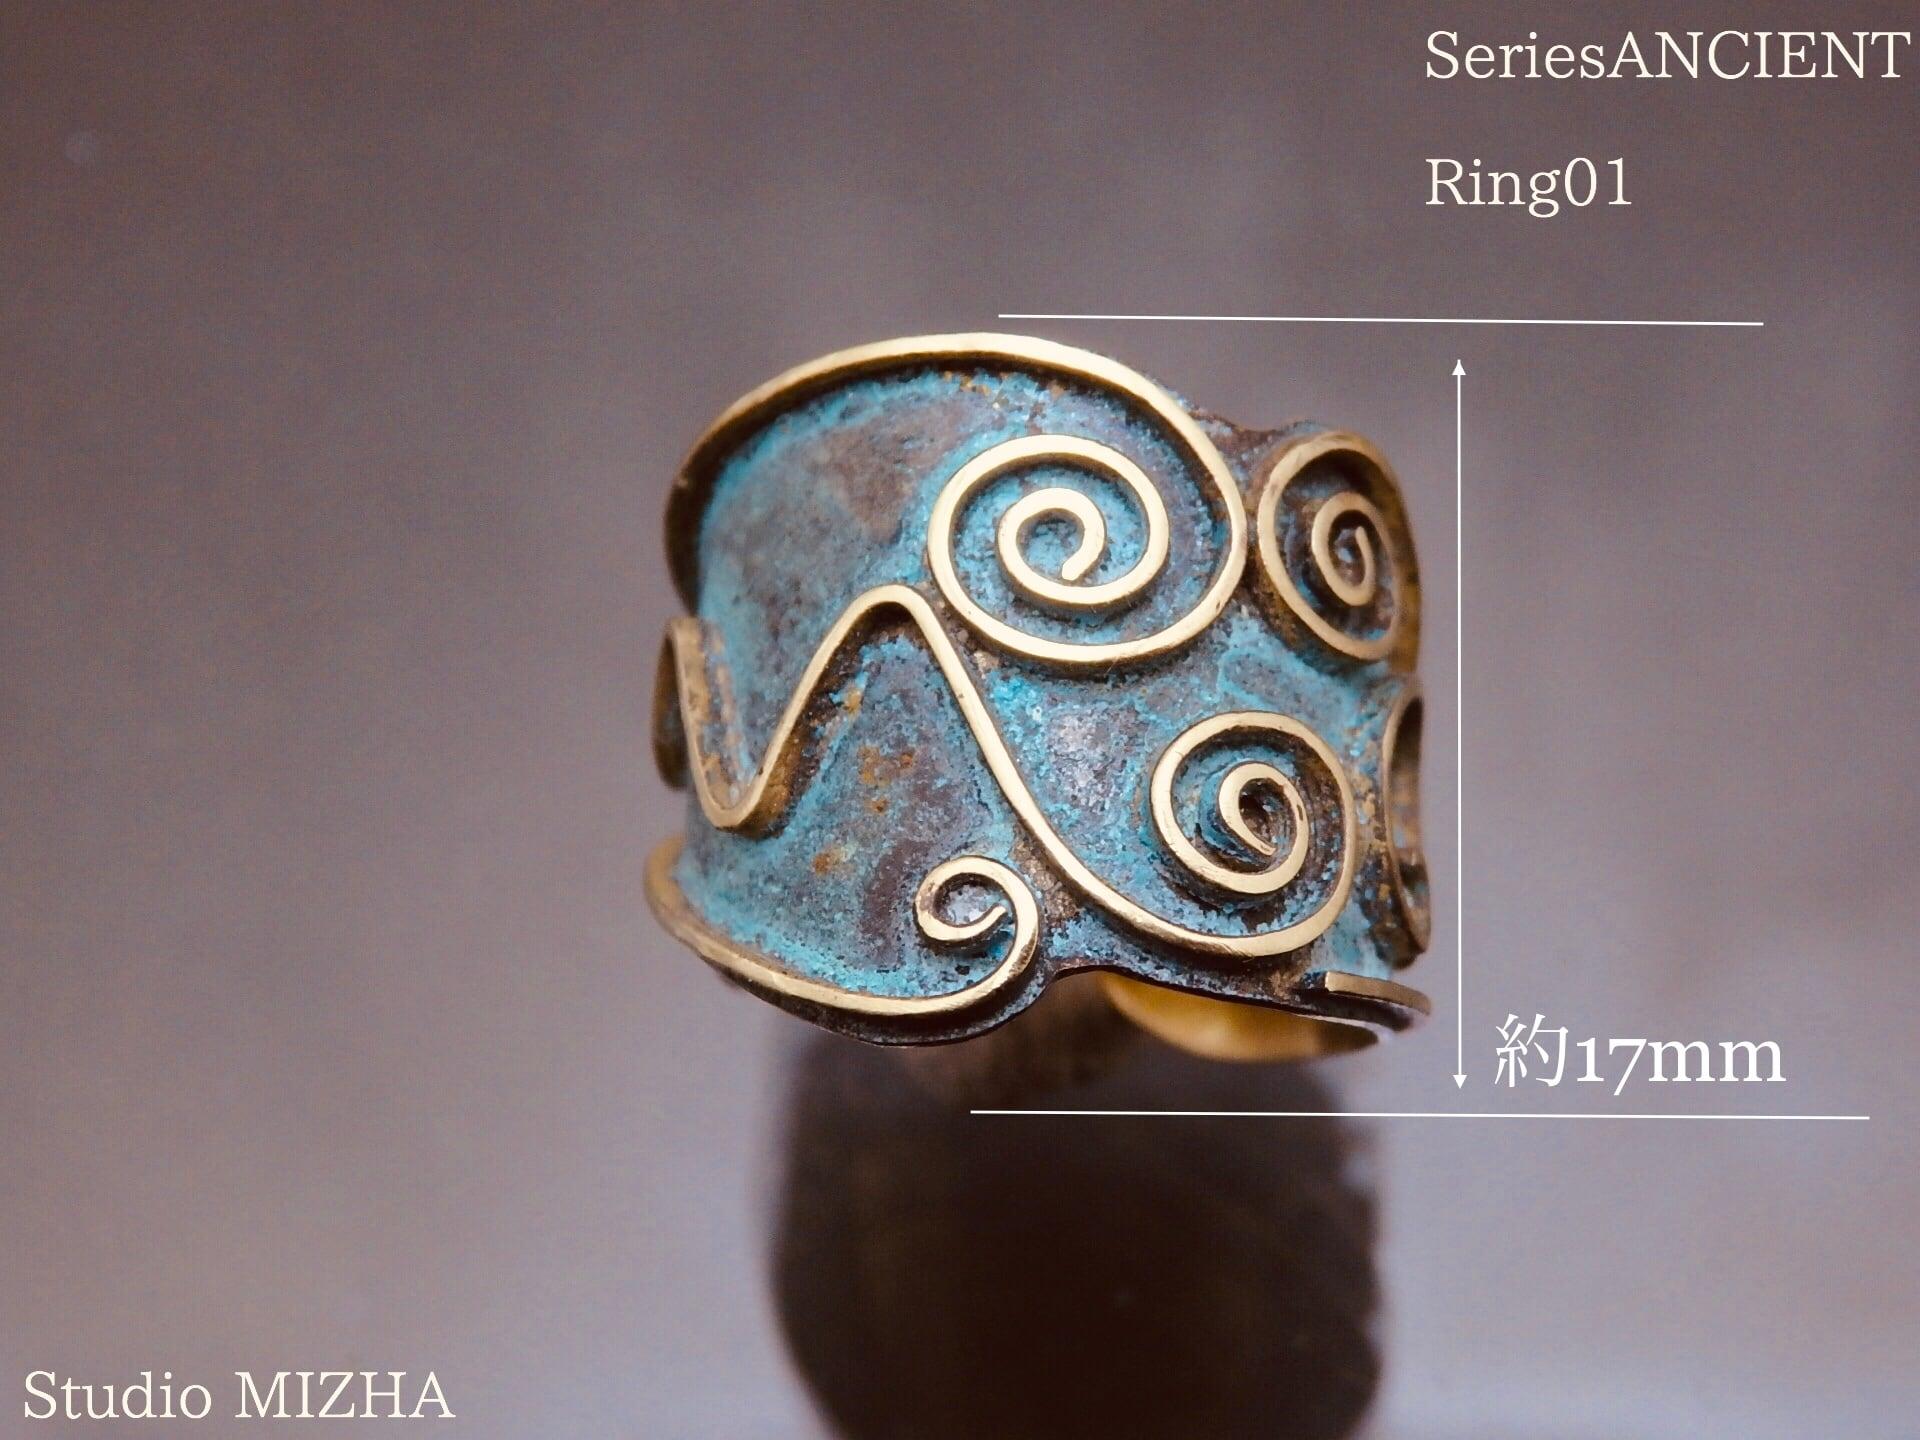 ANCIENT(RING-01)